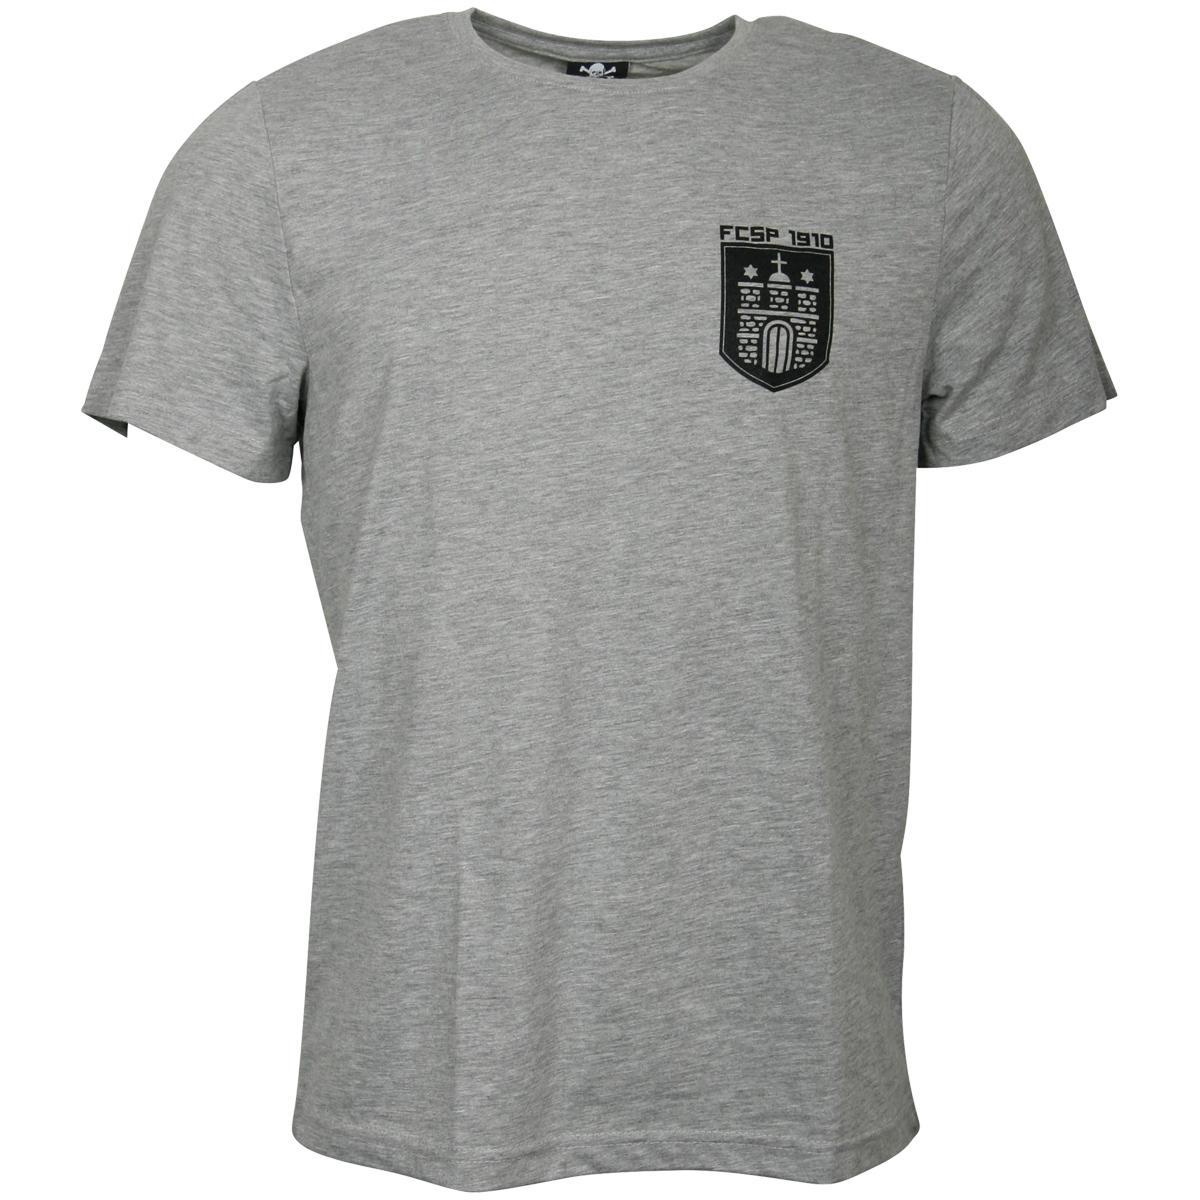 FC St. Pauli - T-Shirt Wappen - grau